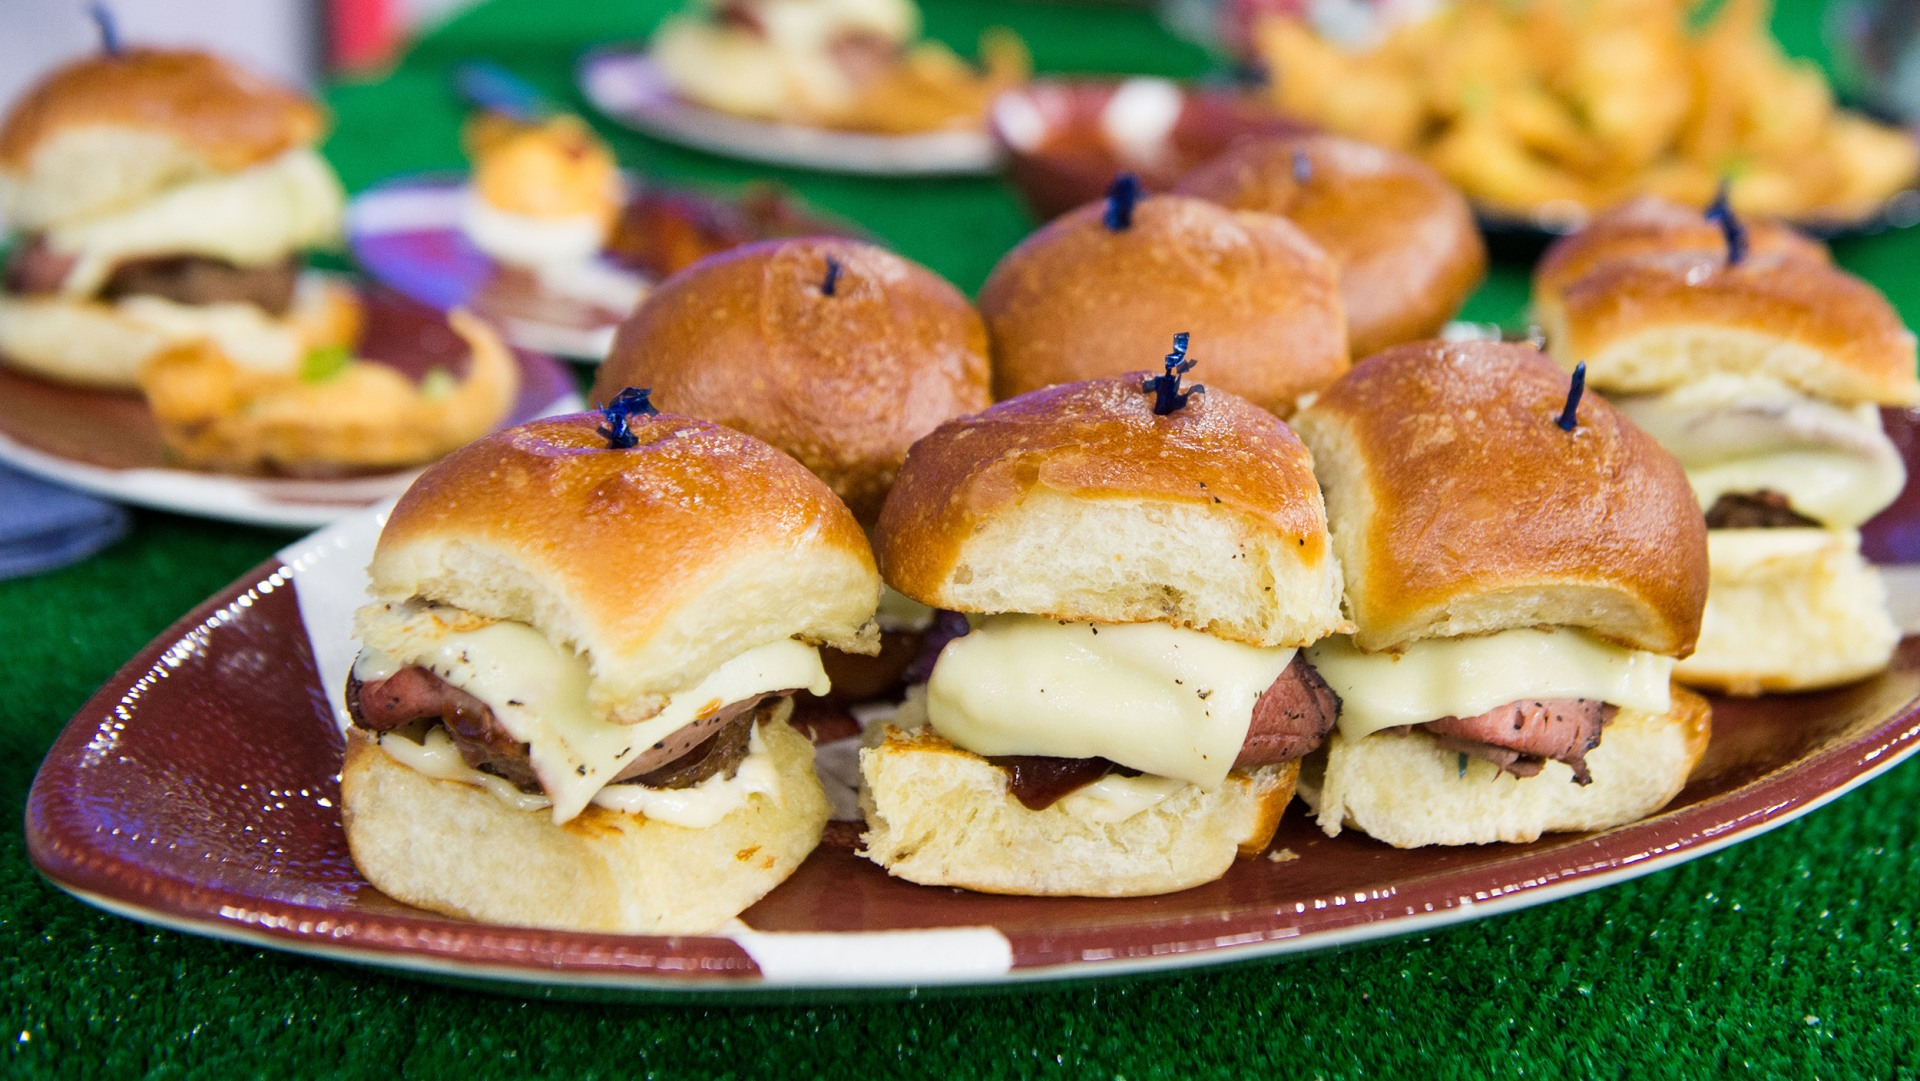 fil a introduces gluten free bun option today com